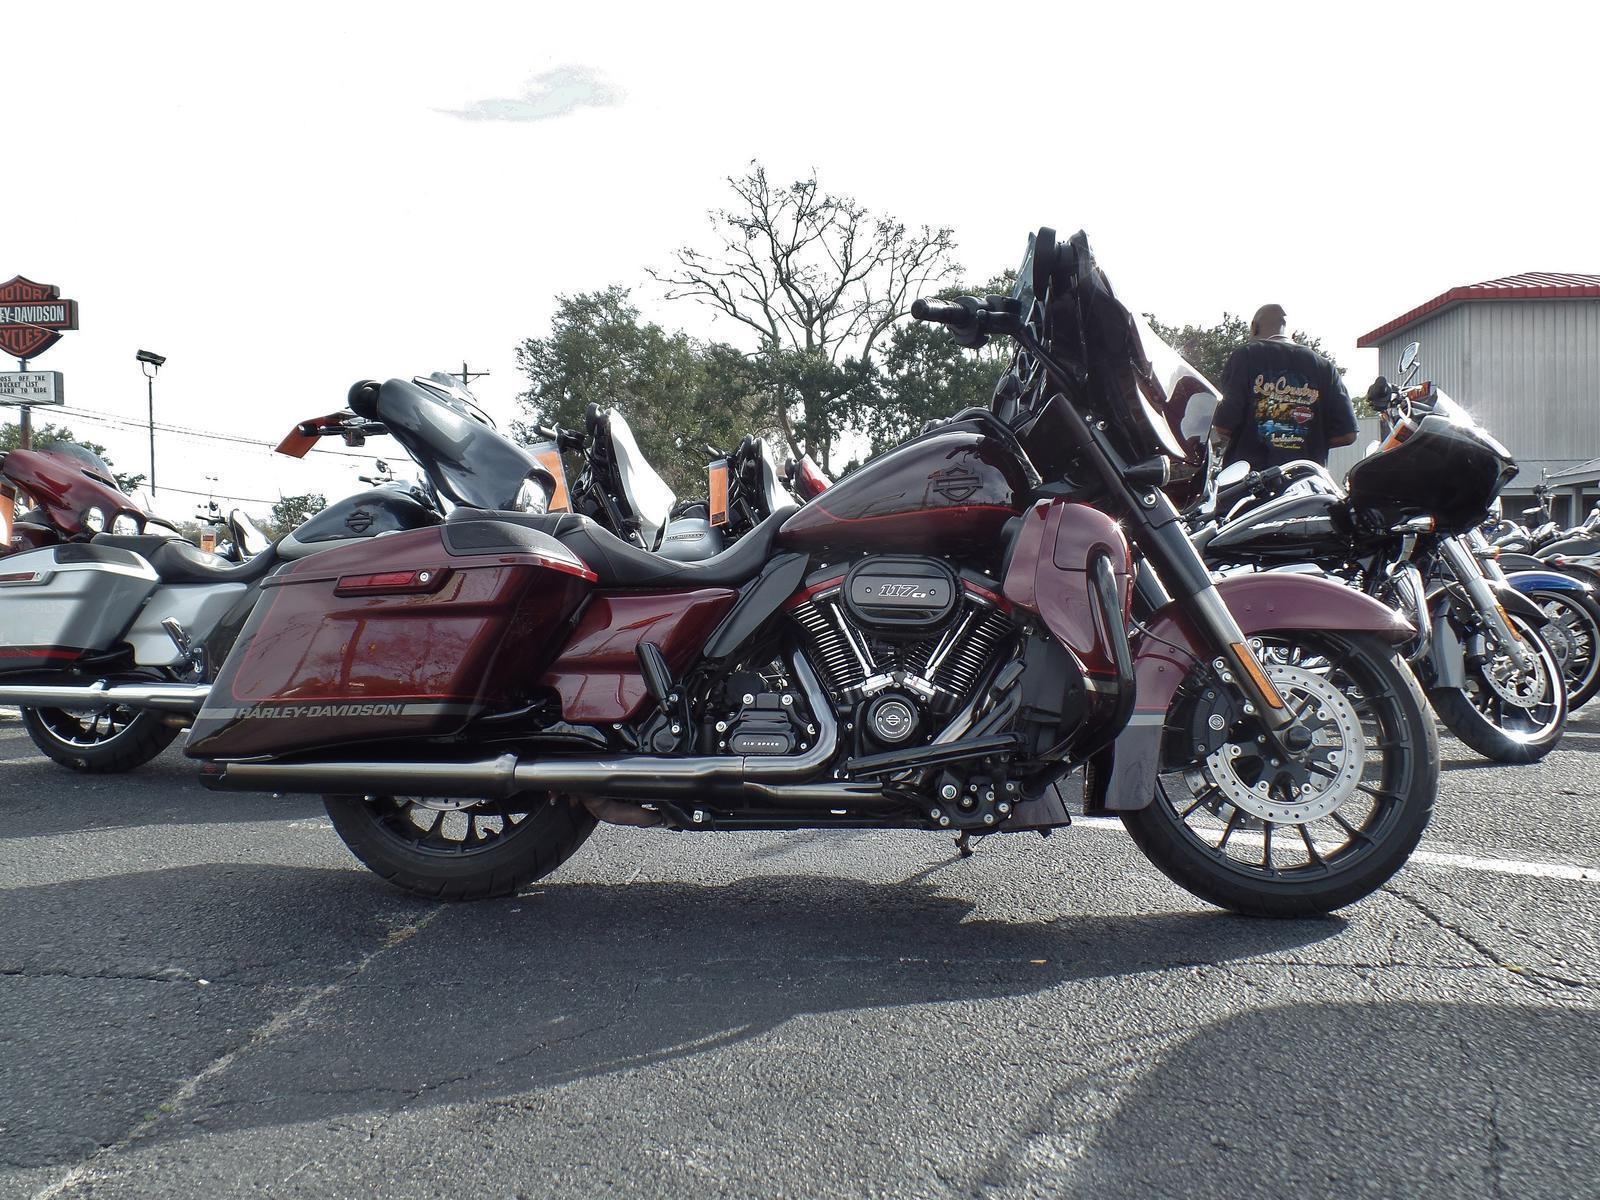 2019 Harley Davidson Street Glide Cvo Street Glide